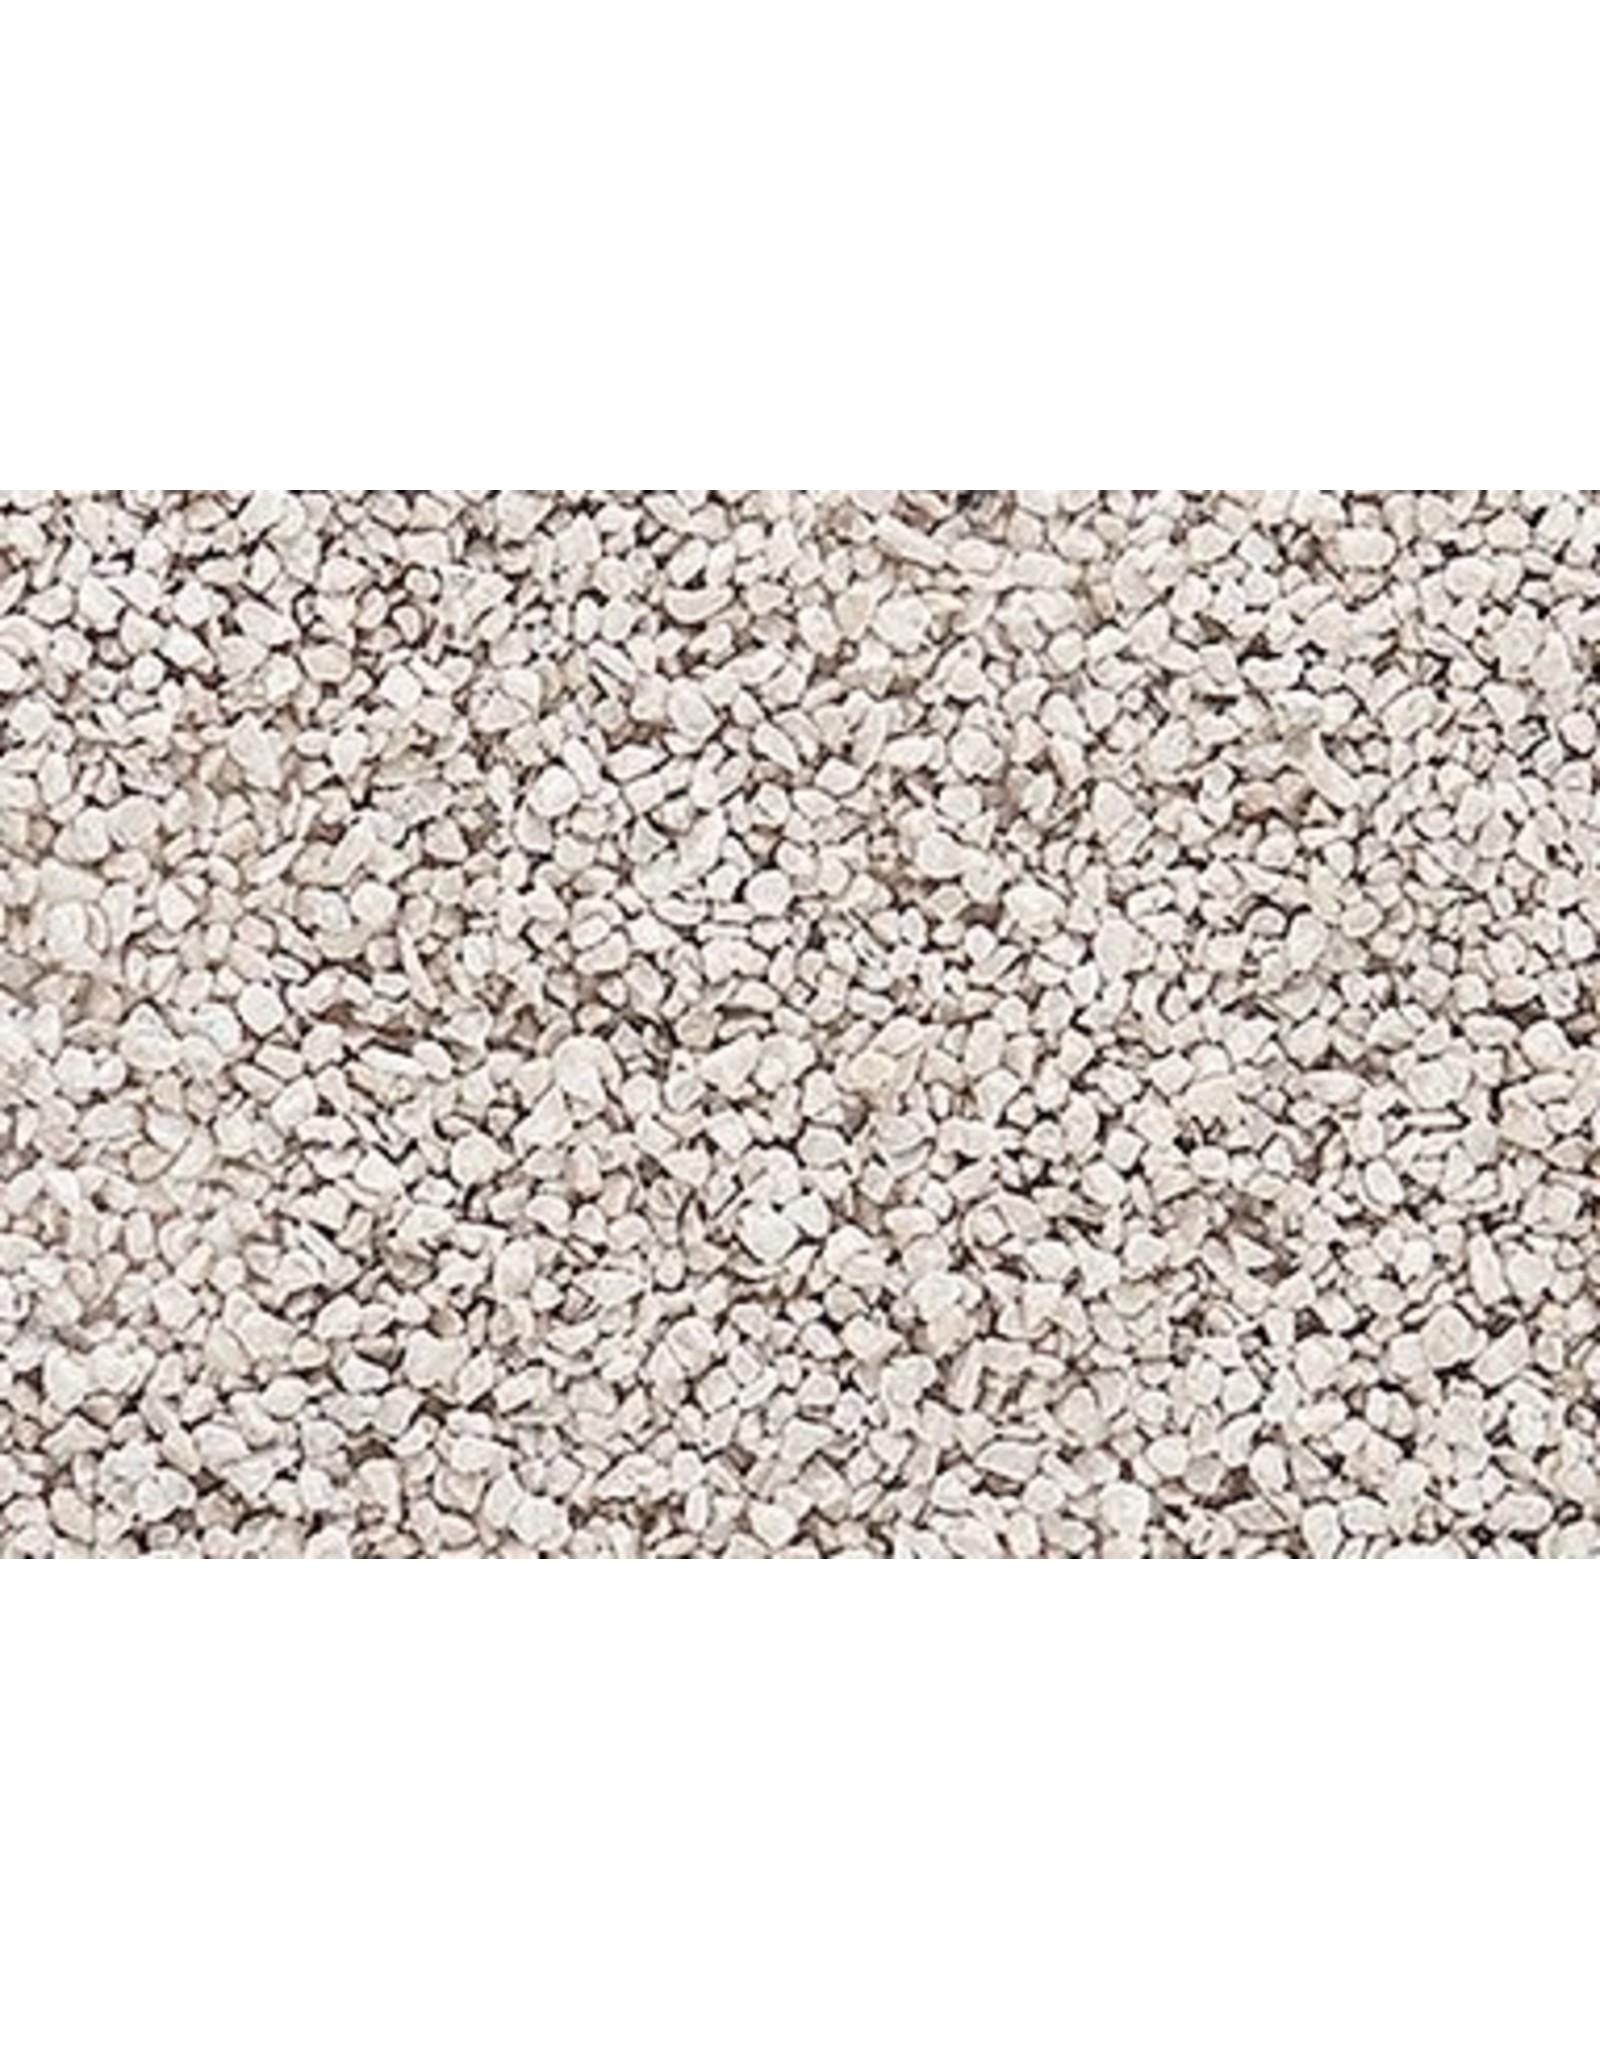 Woodland Scenics B1381 - Medium Ballast Shaker, Light Gray